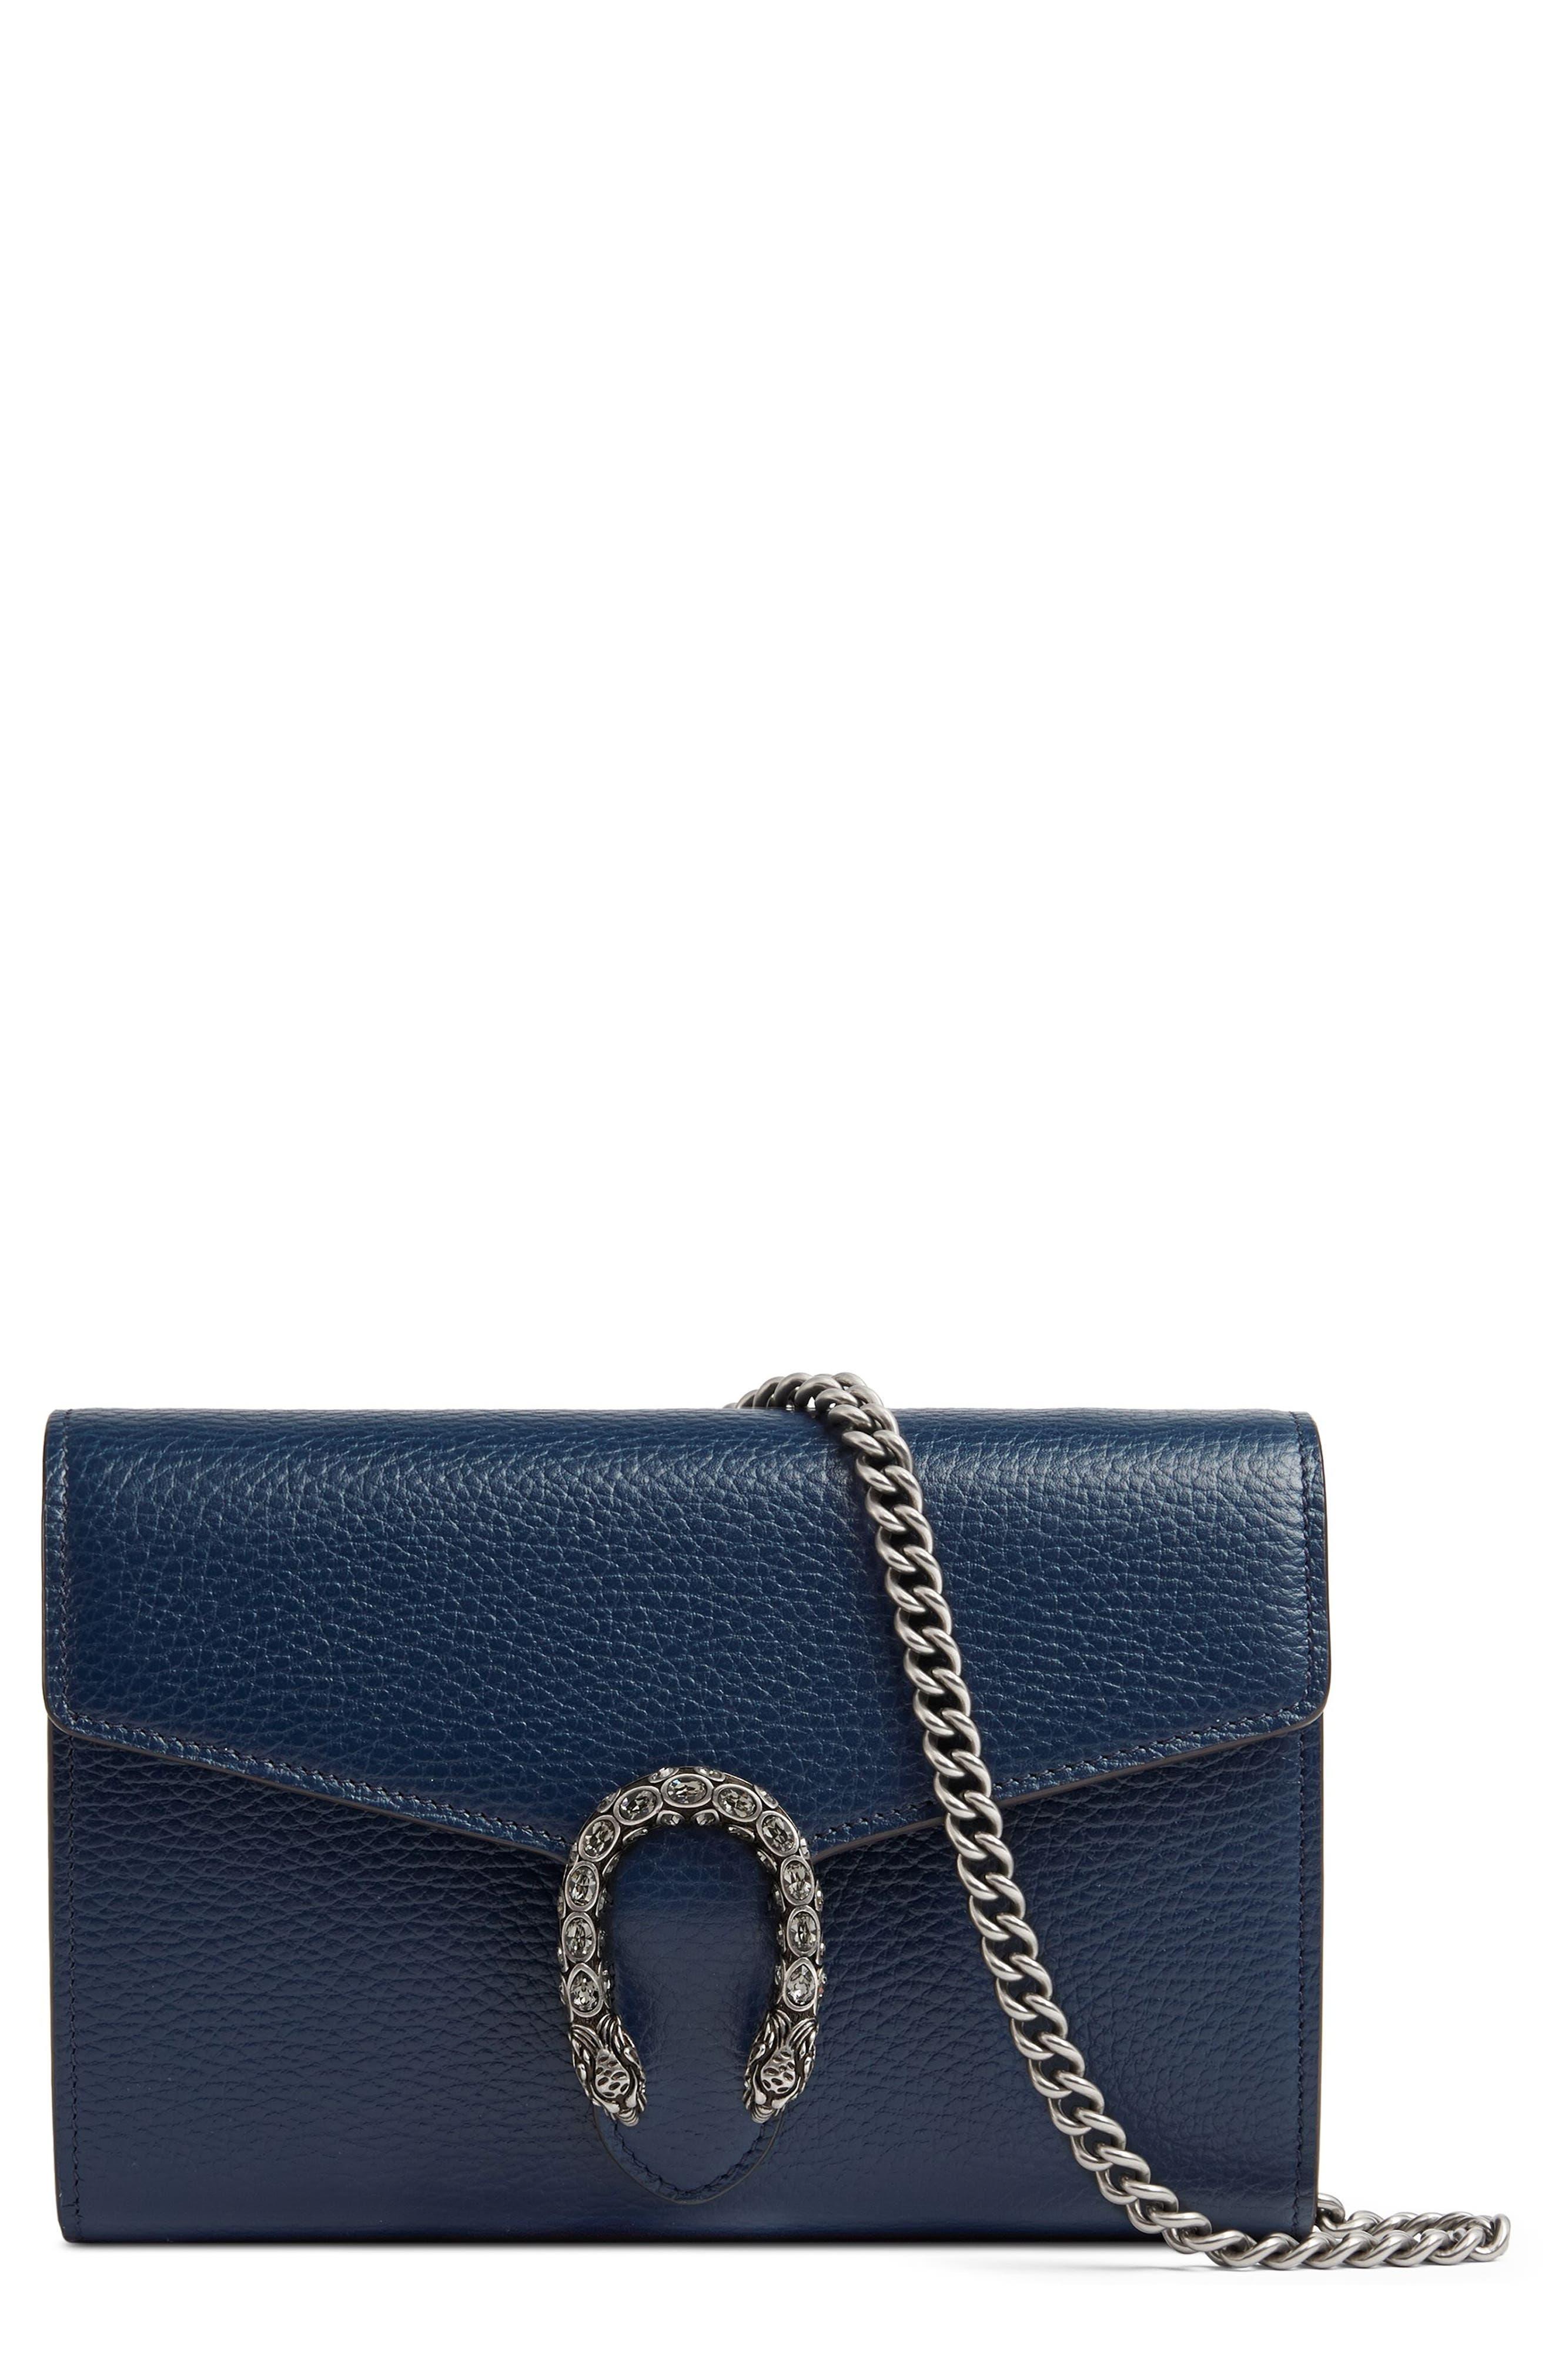 Dionysus Leather Wallet on a Chain,                             Main thumbnail 1, color,                             BLU AGATA/ BLACK DIAMOND